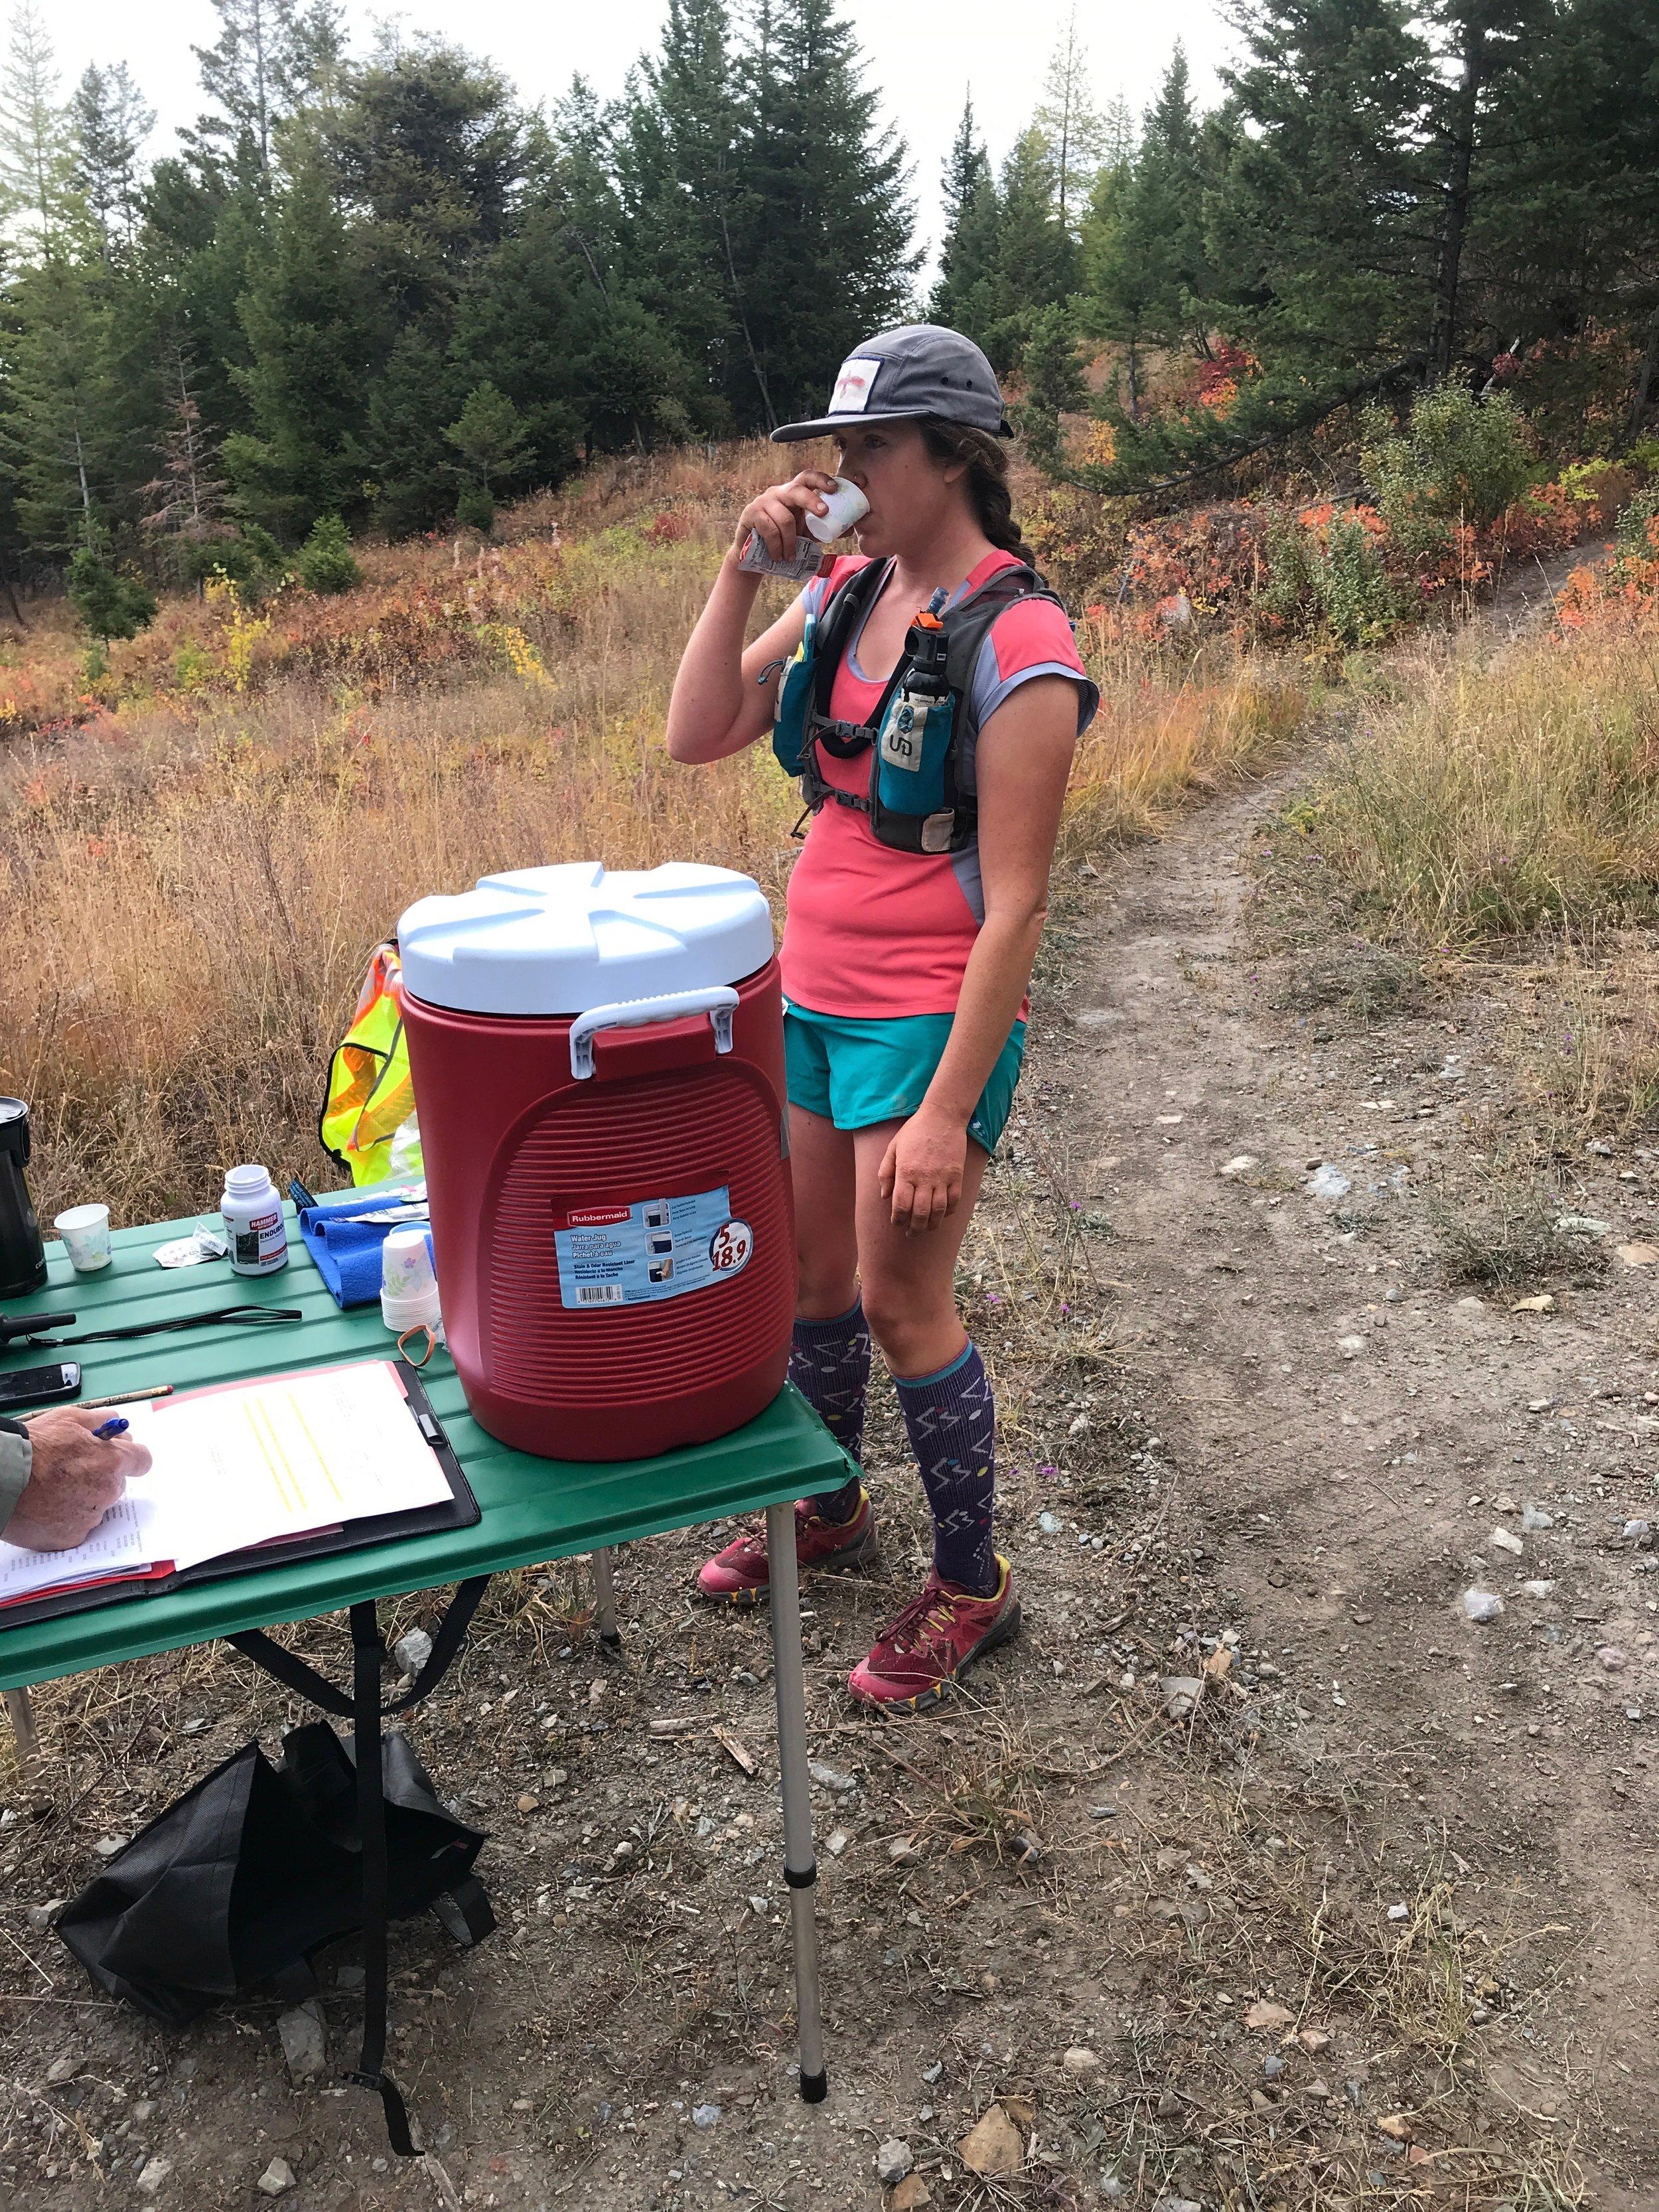 foys to blacktail trails trail marathon ftbtIMG_1752.JPG